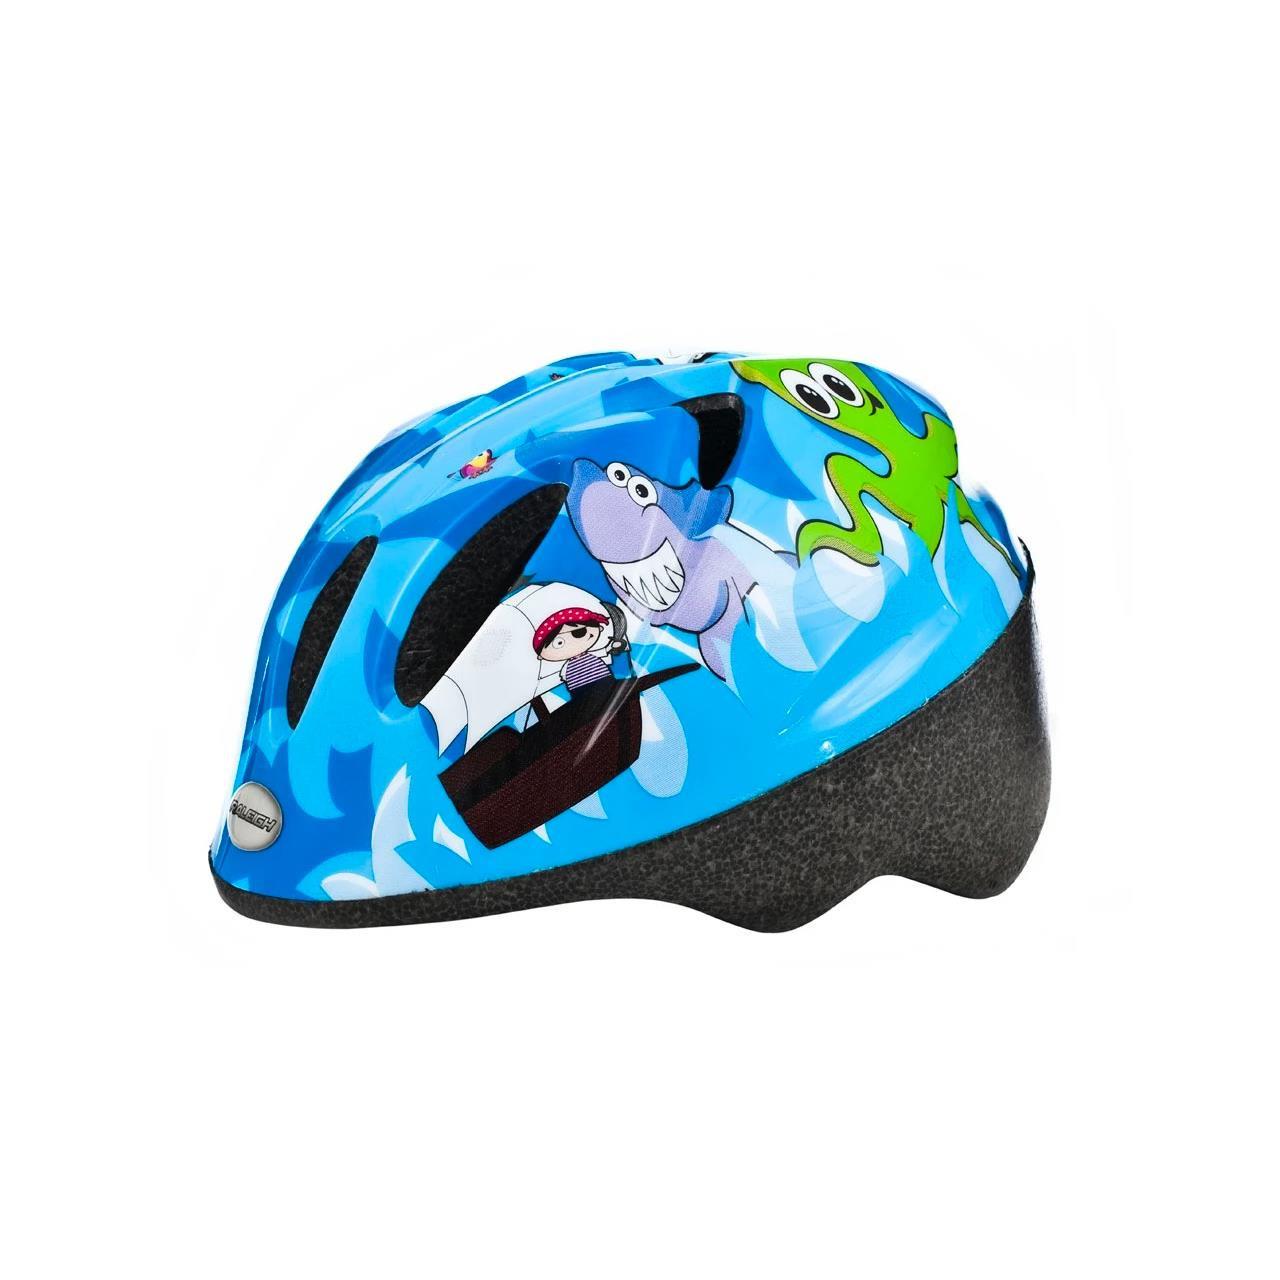 Raleigh Rascal Kids' Blue Pirate Cycle Helmet